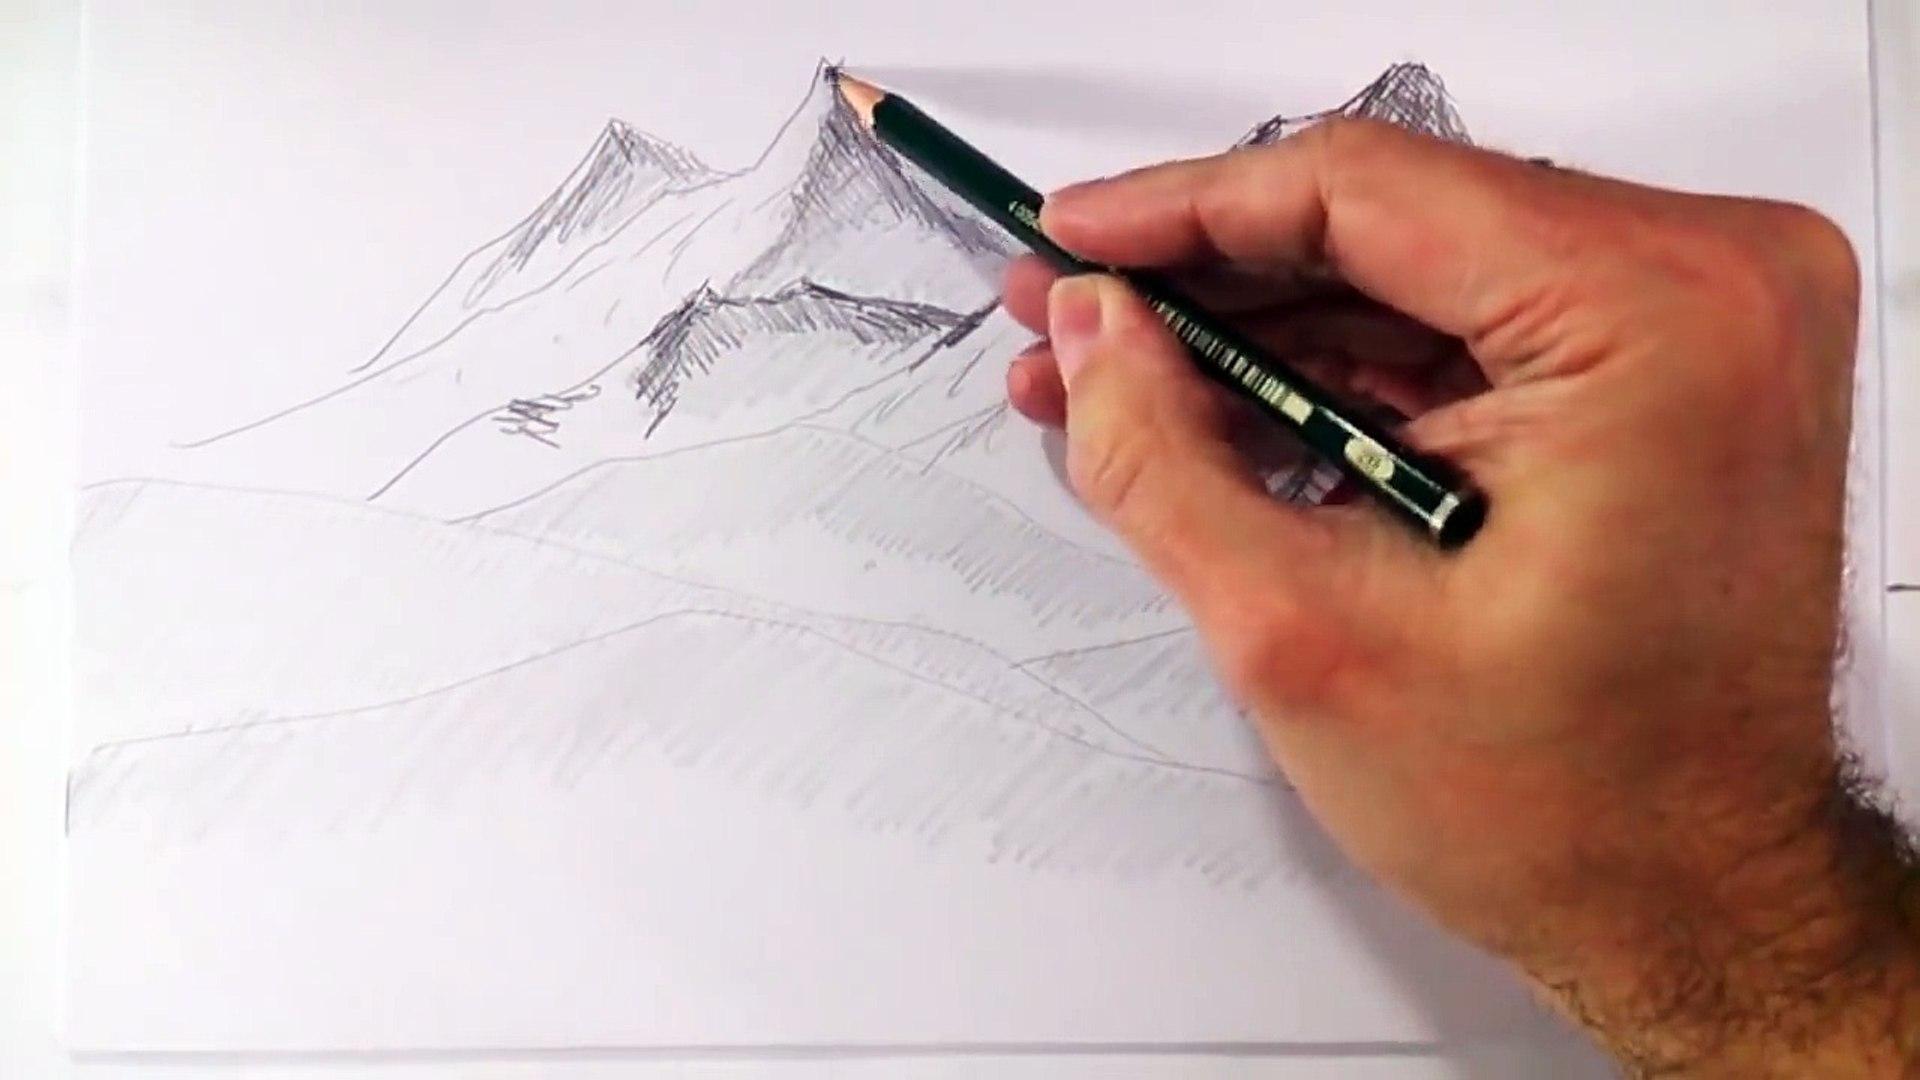 Como Dibujar Montañas Realistas A Lapiz Faciles Y Paso A Paso видео Dailymotion